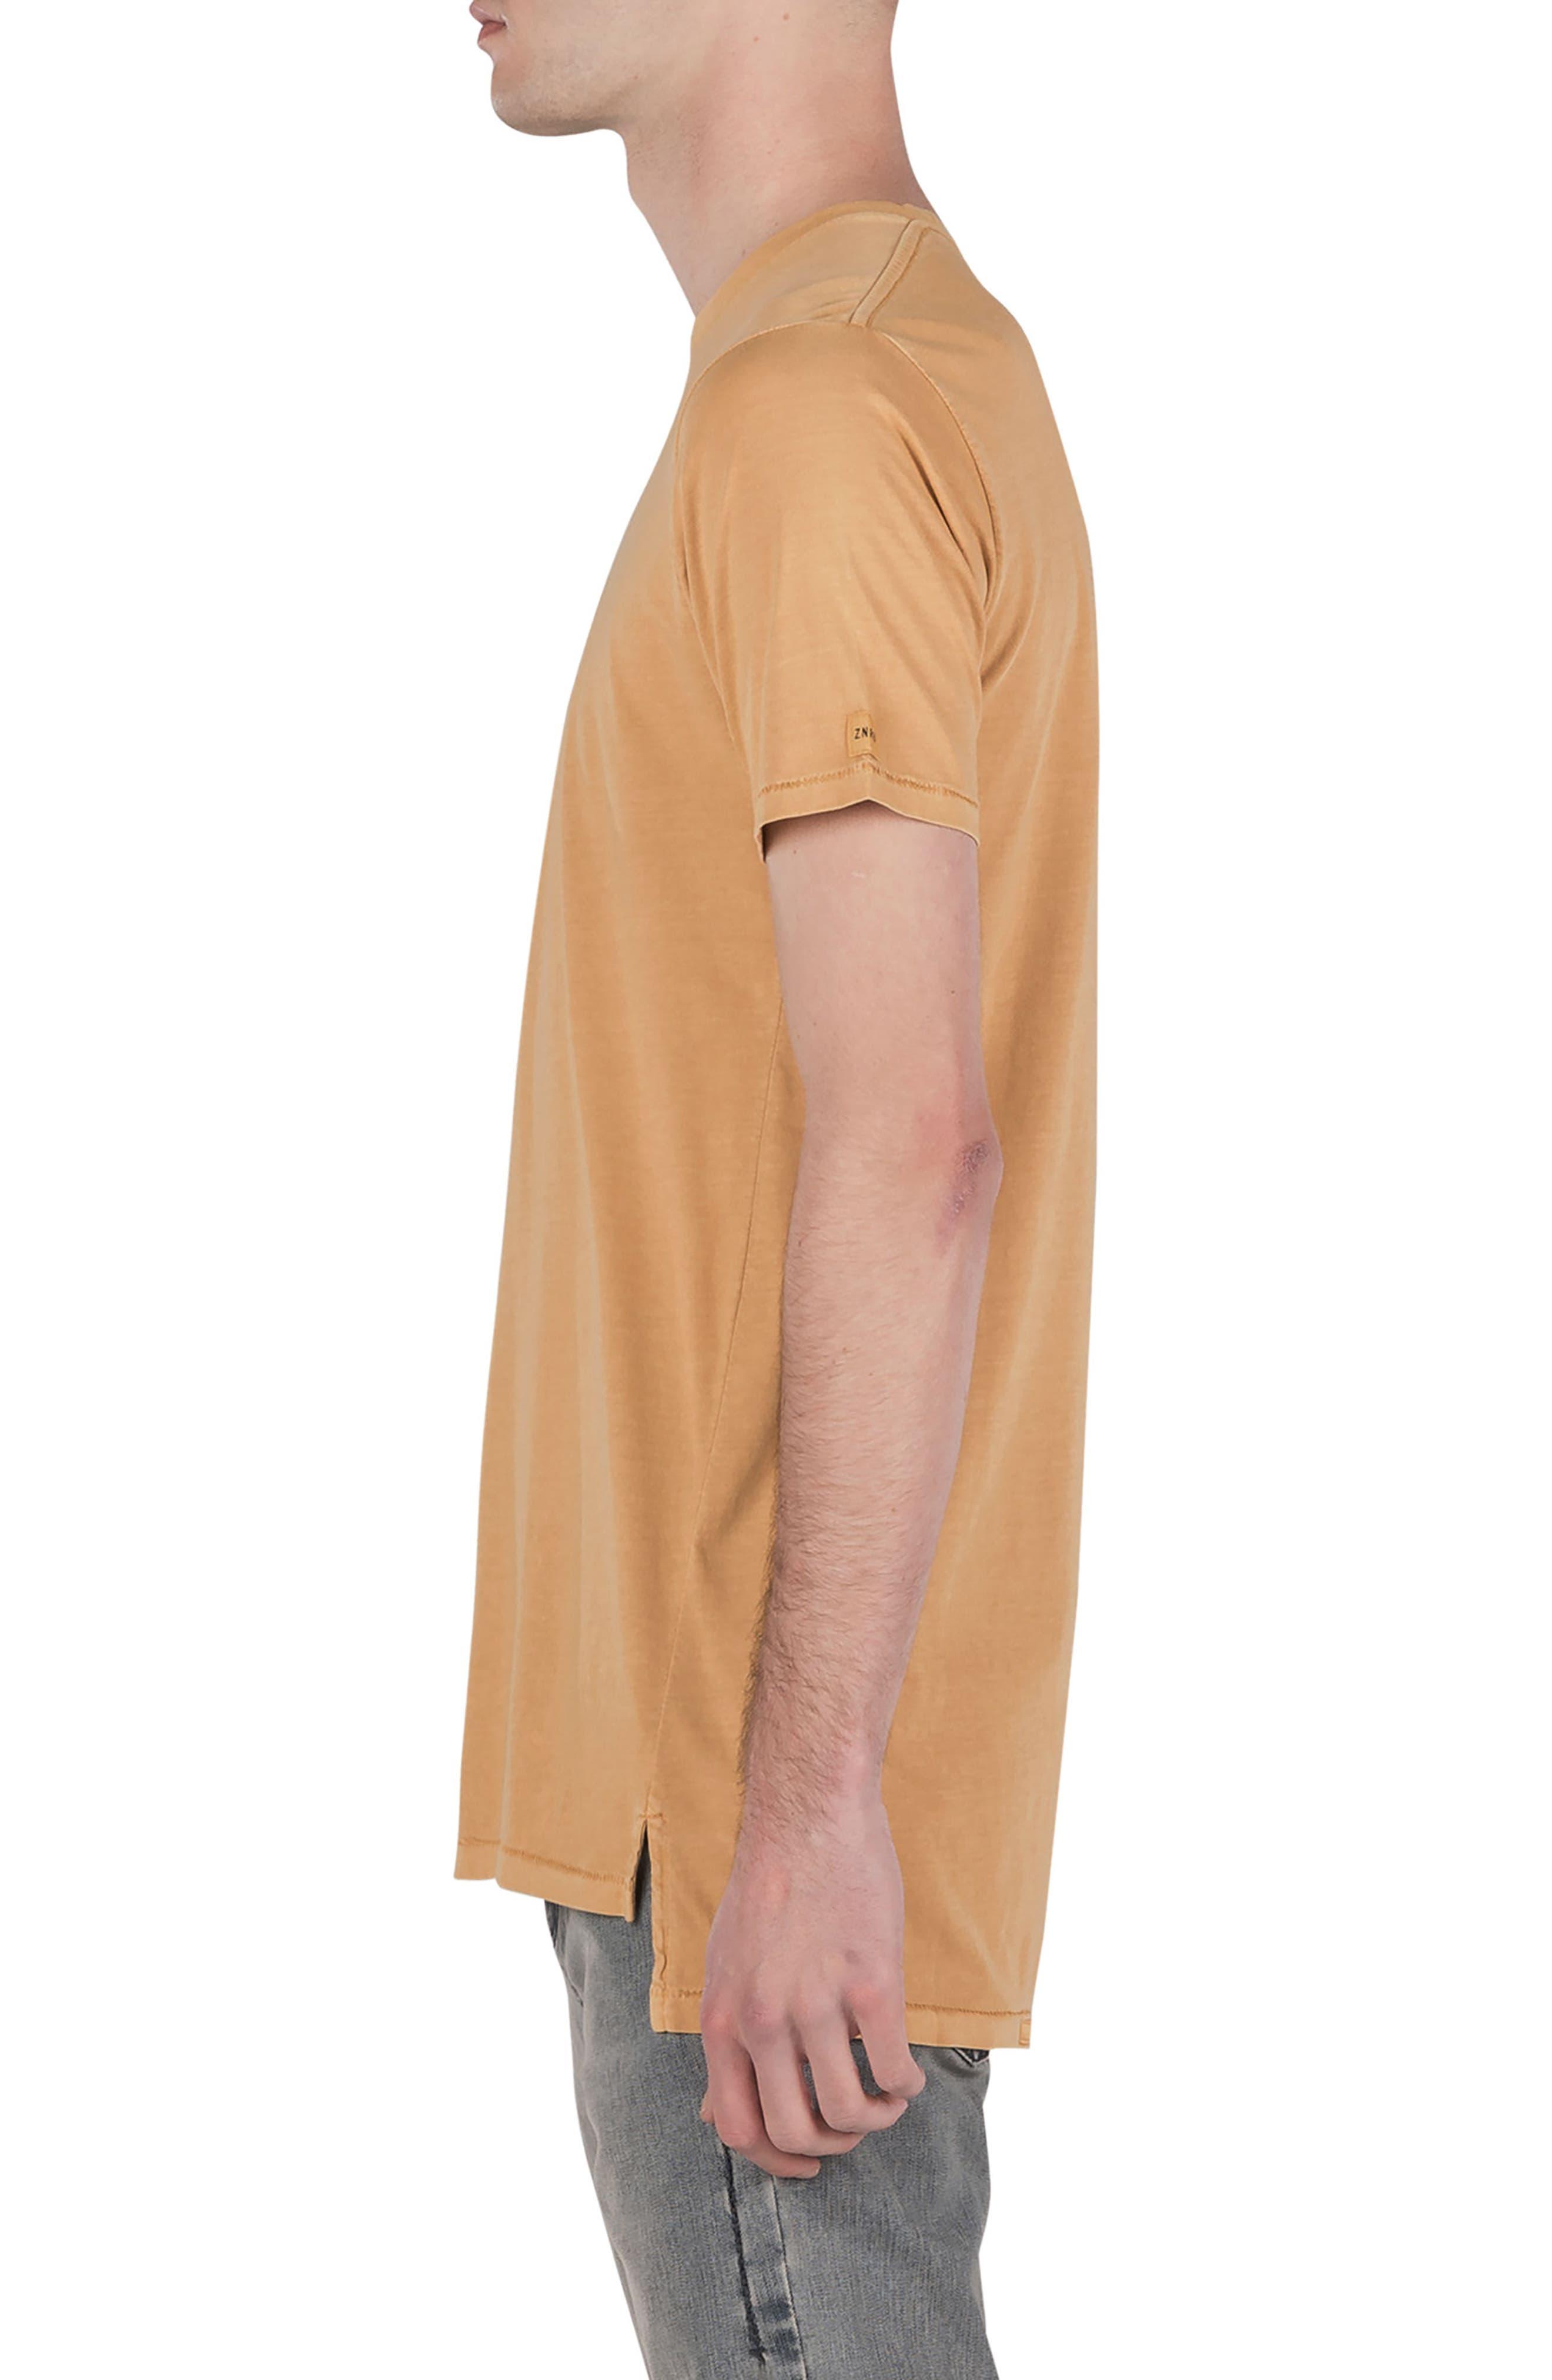 Flintlock T-Shirt,                             Alternate thumbnail 2, color,                             800